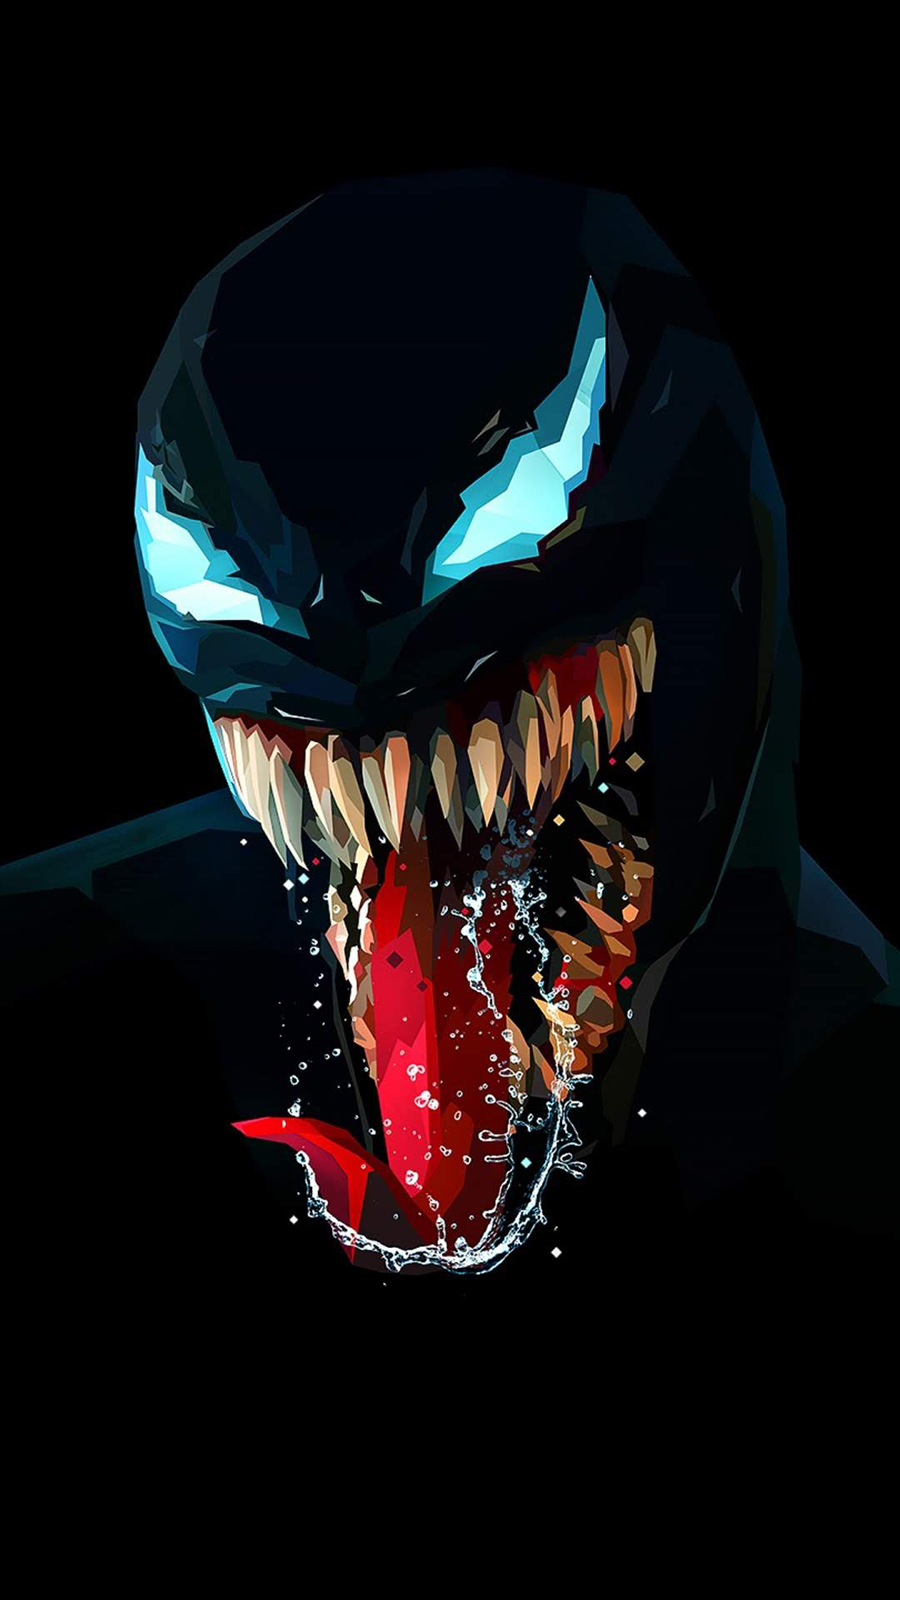 Spider Man HD Wallpapers Free Download for Phone & Desktop